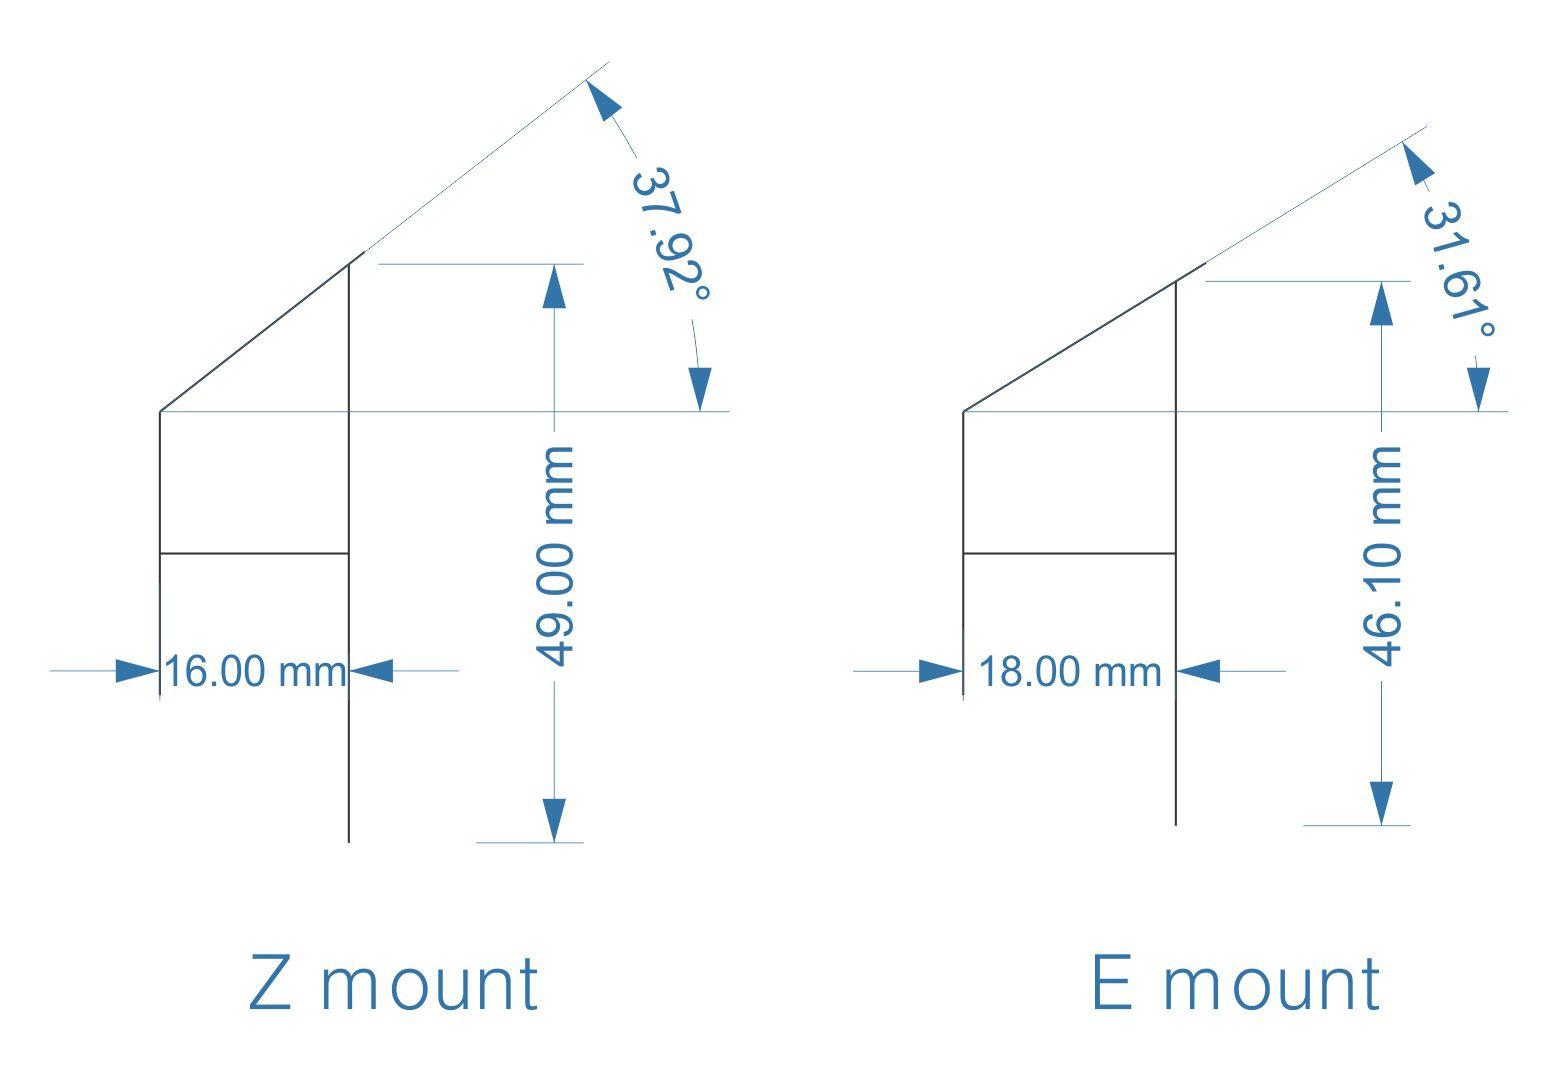 Nikon-Z-mount-vs-Sony-E-mount-comparison.jpg